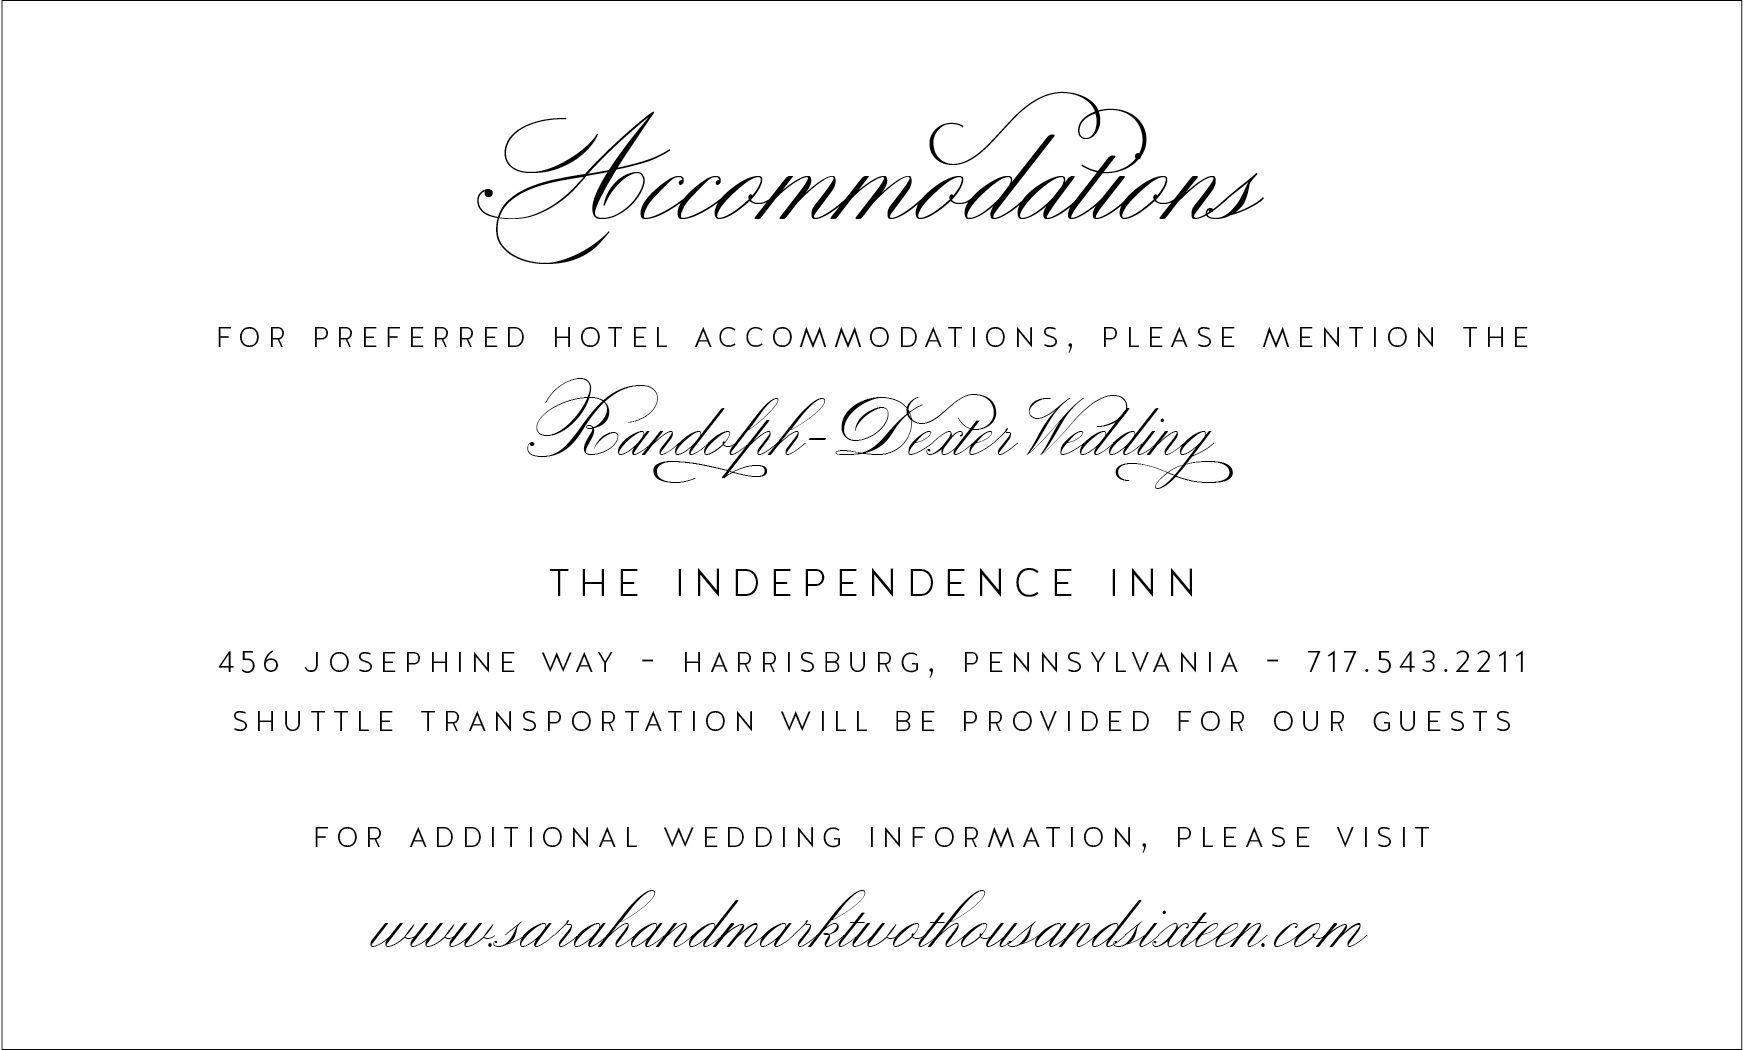 What S In A Wedding Invitation Wedding Direction Cards Wedding Directions Wedding Accommodations